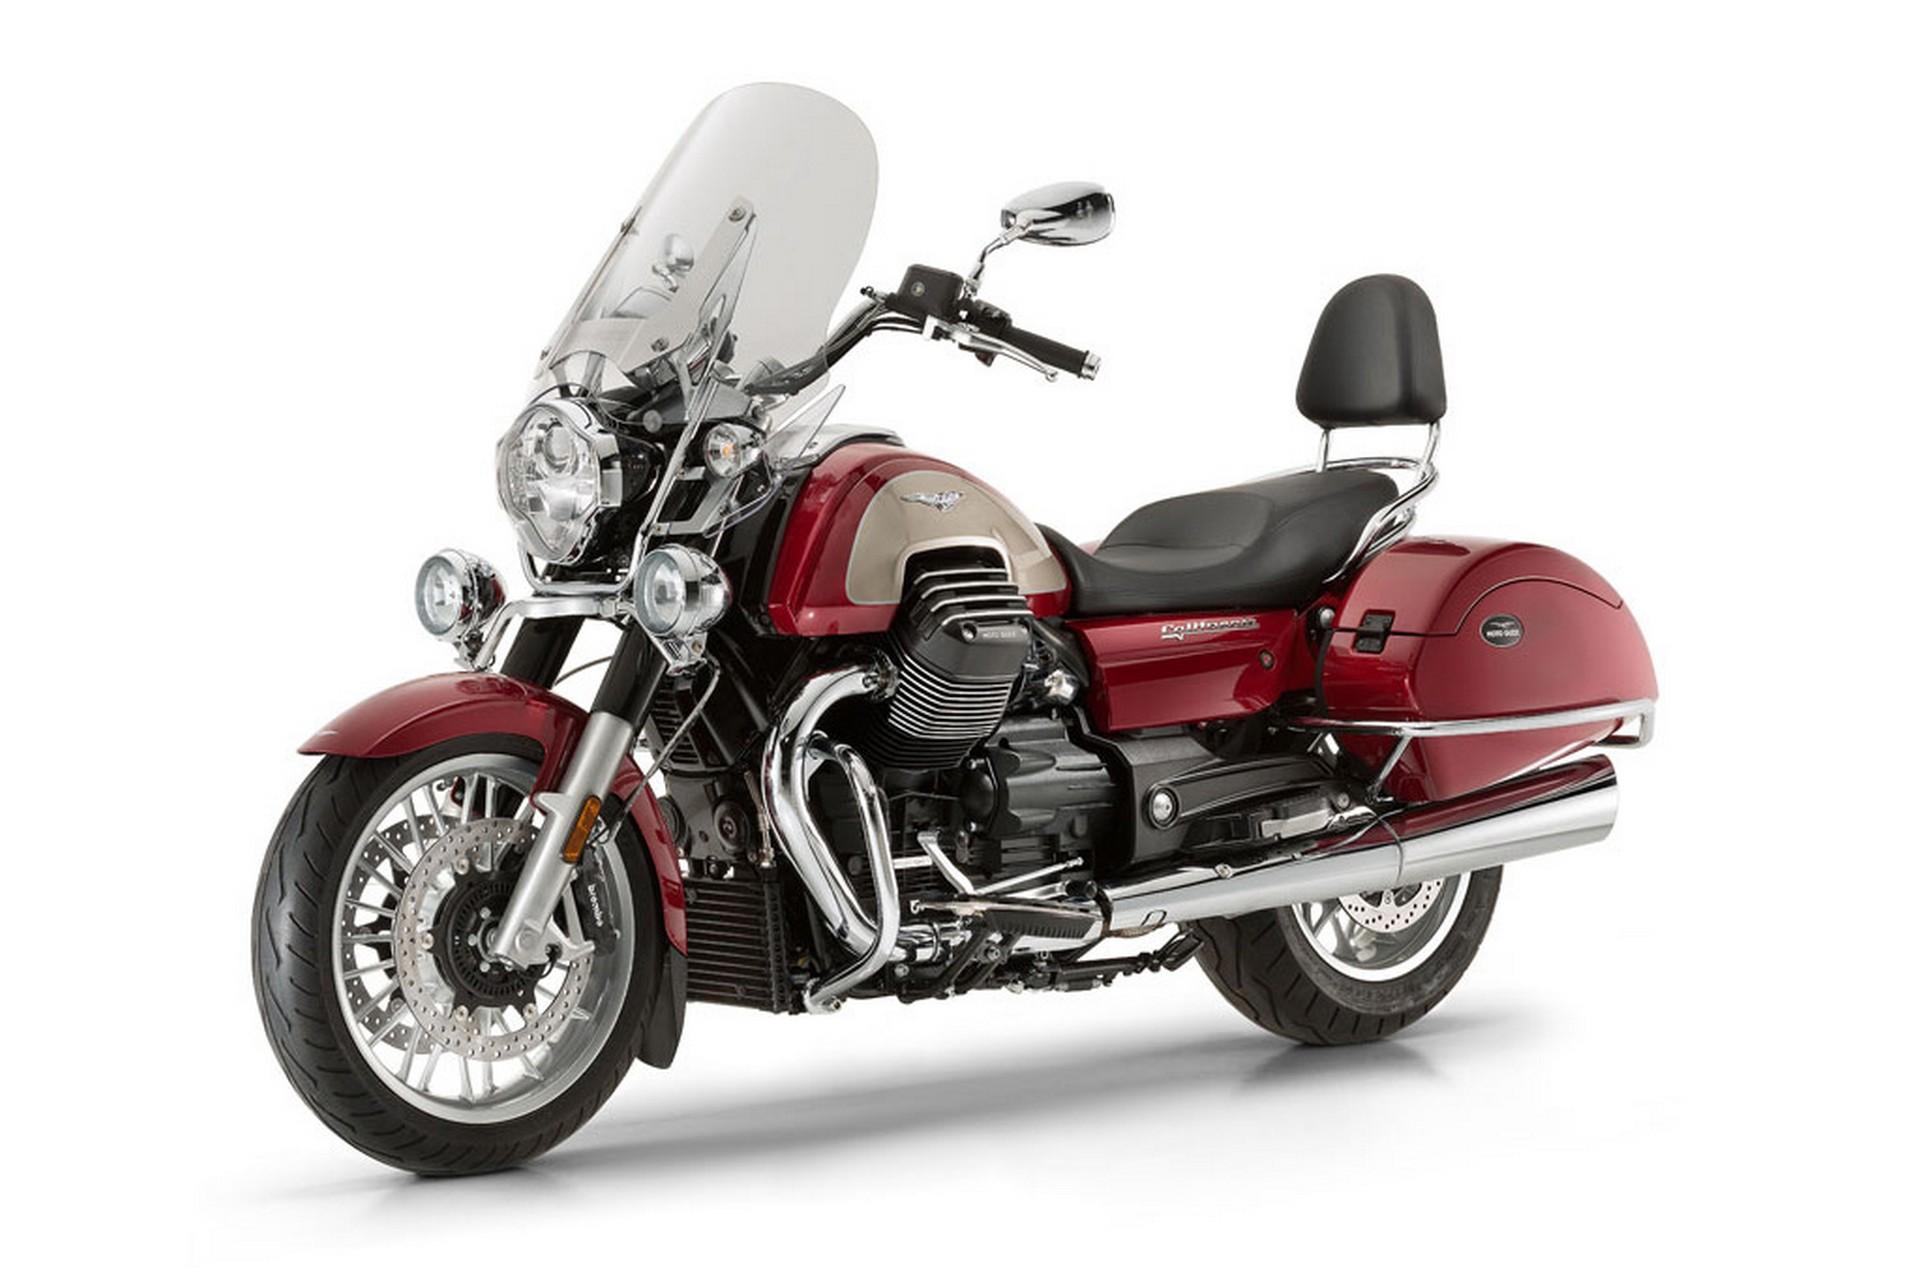 Moto Guzzi California Touring 1400